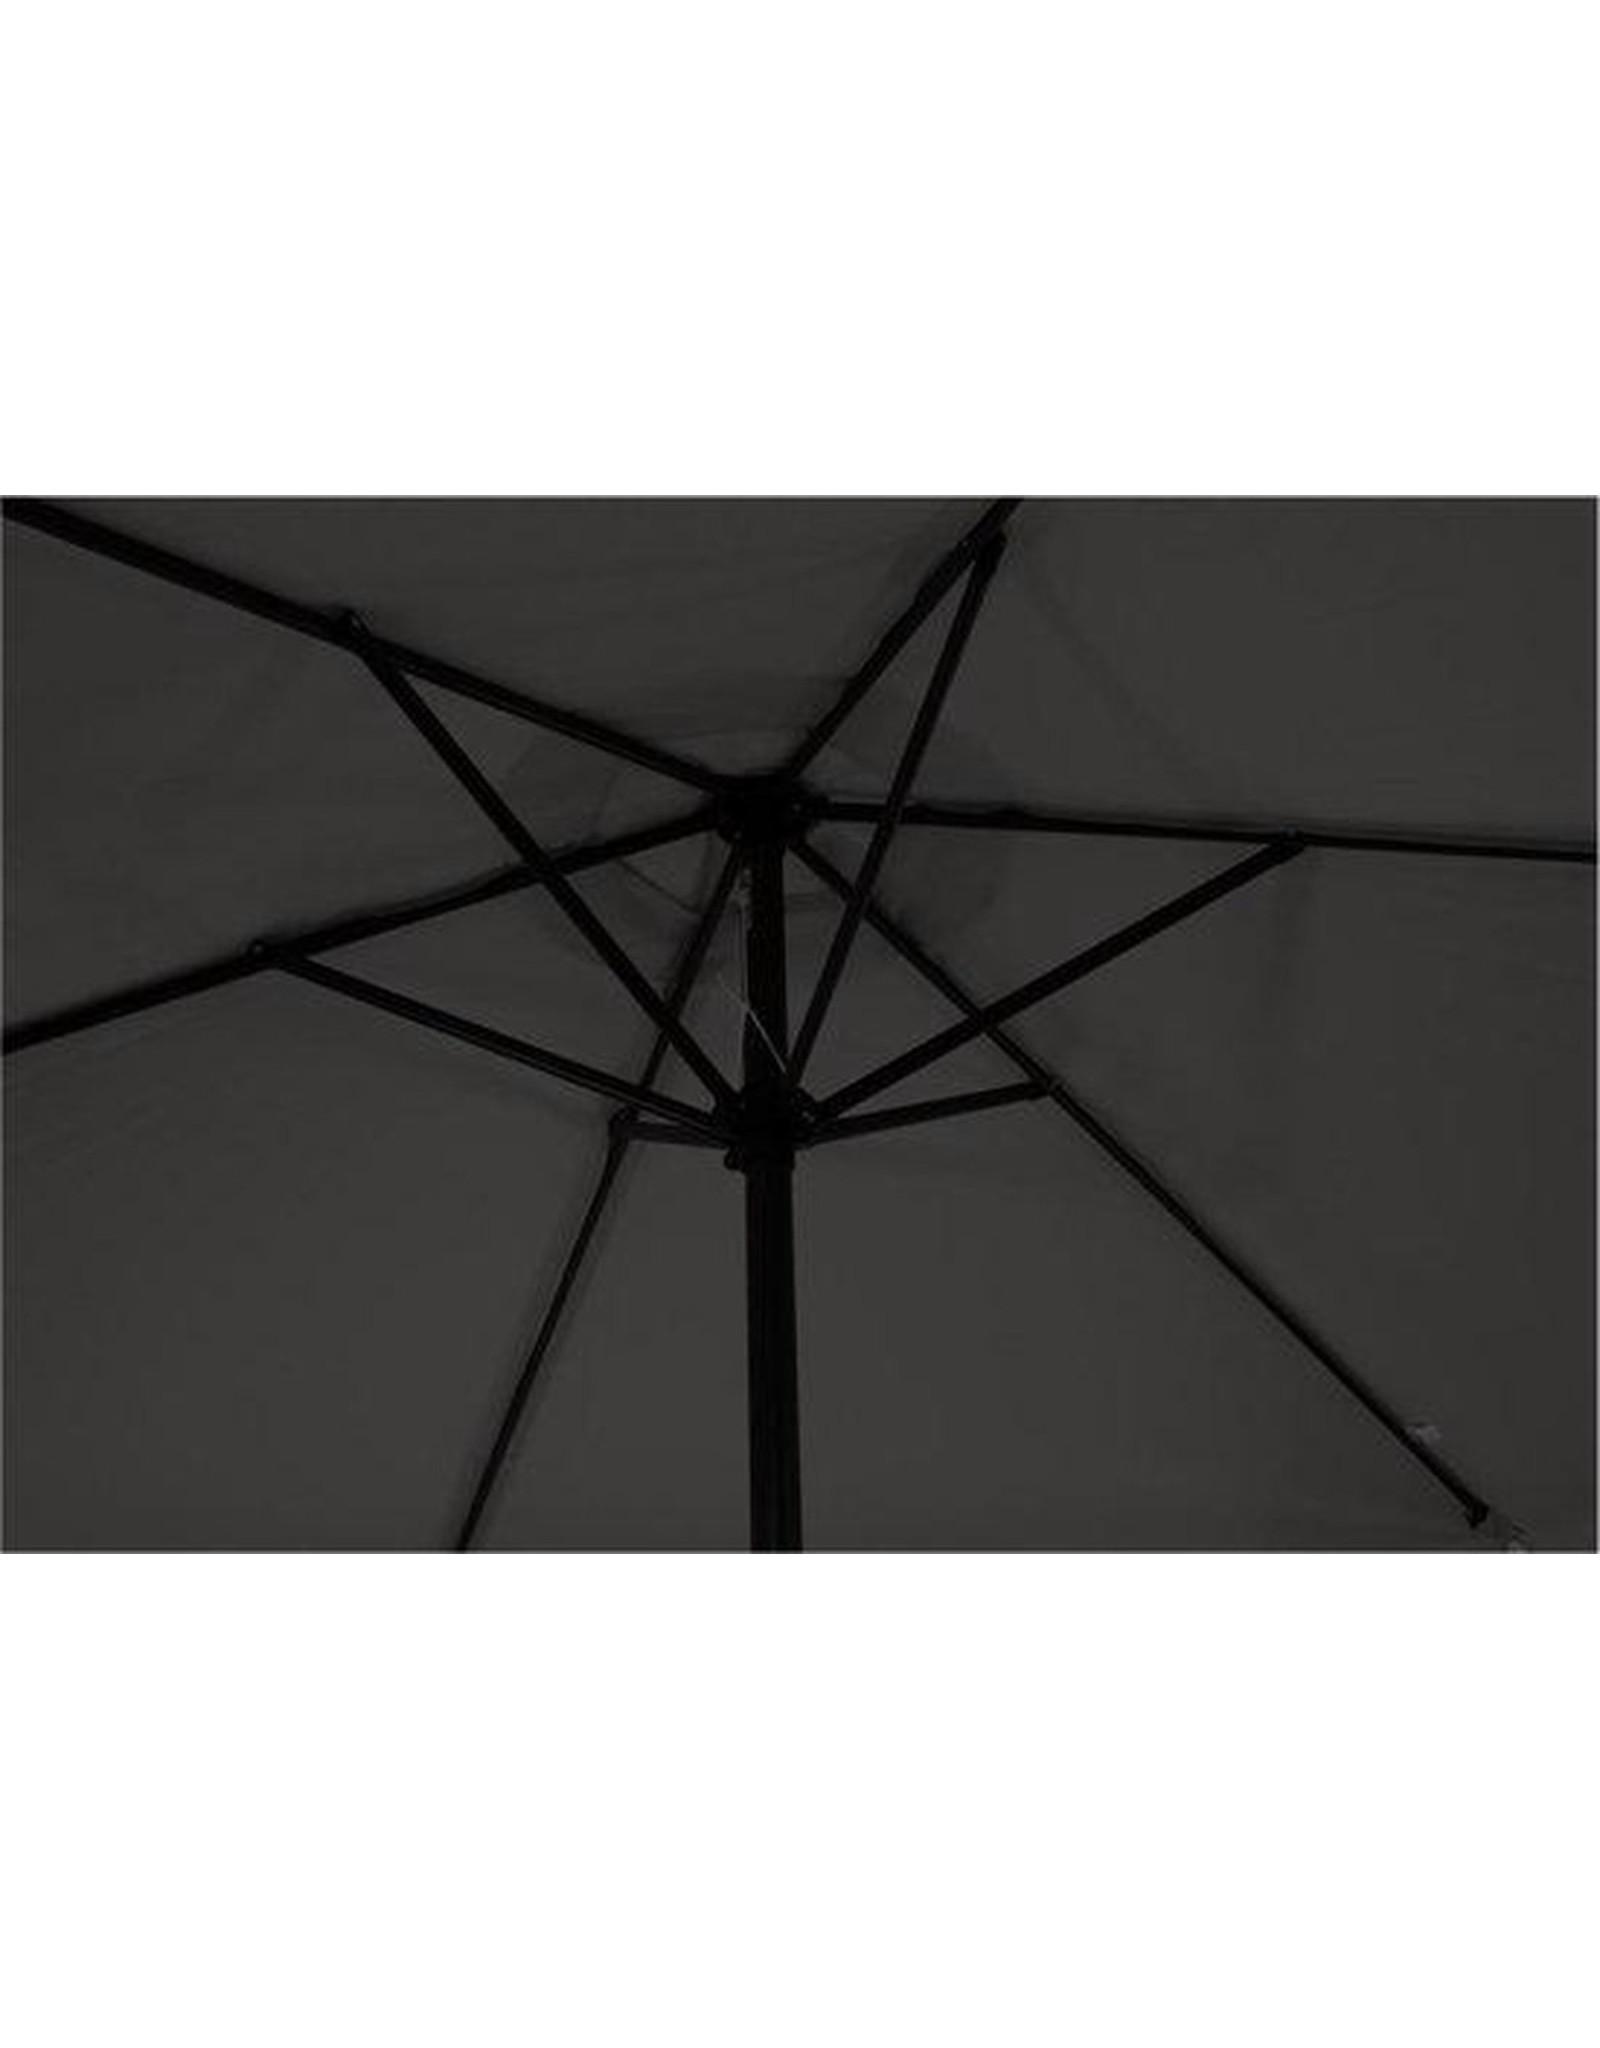 Outdoor Living Gemini Parasol - stokparasol - Ø300 cm - Donkergrijs